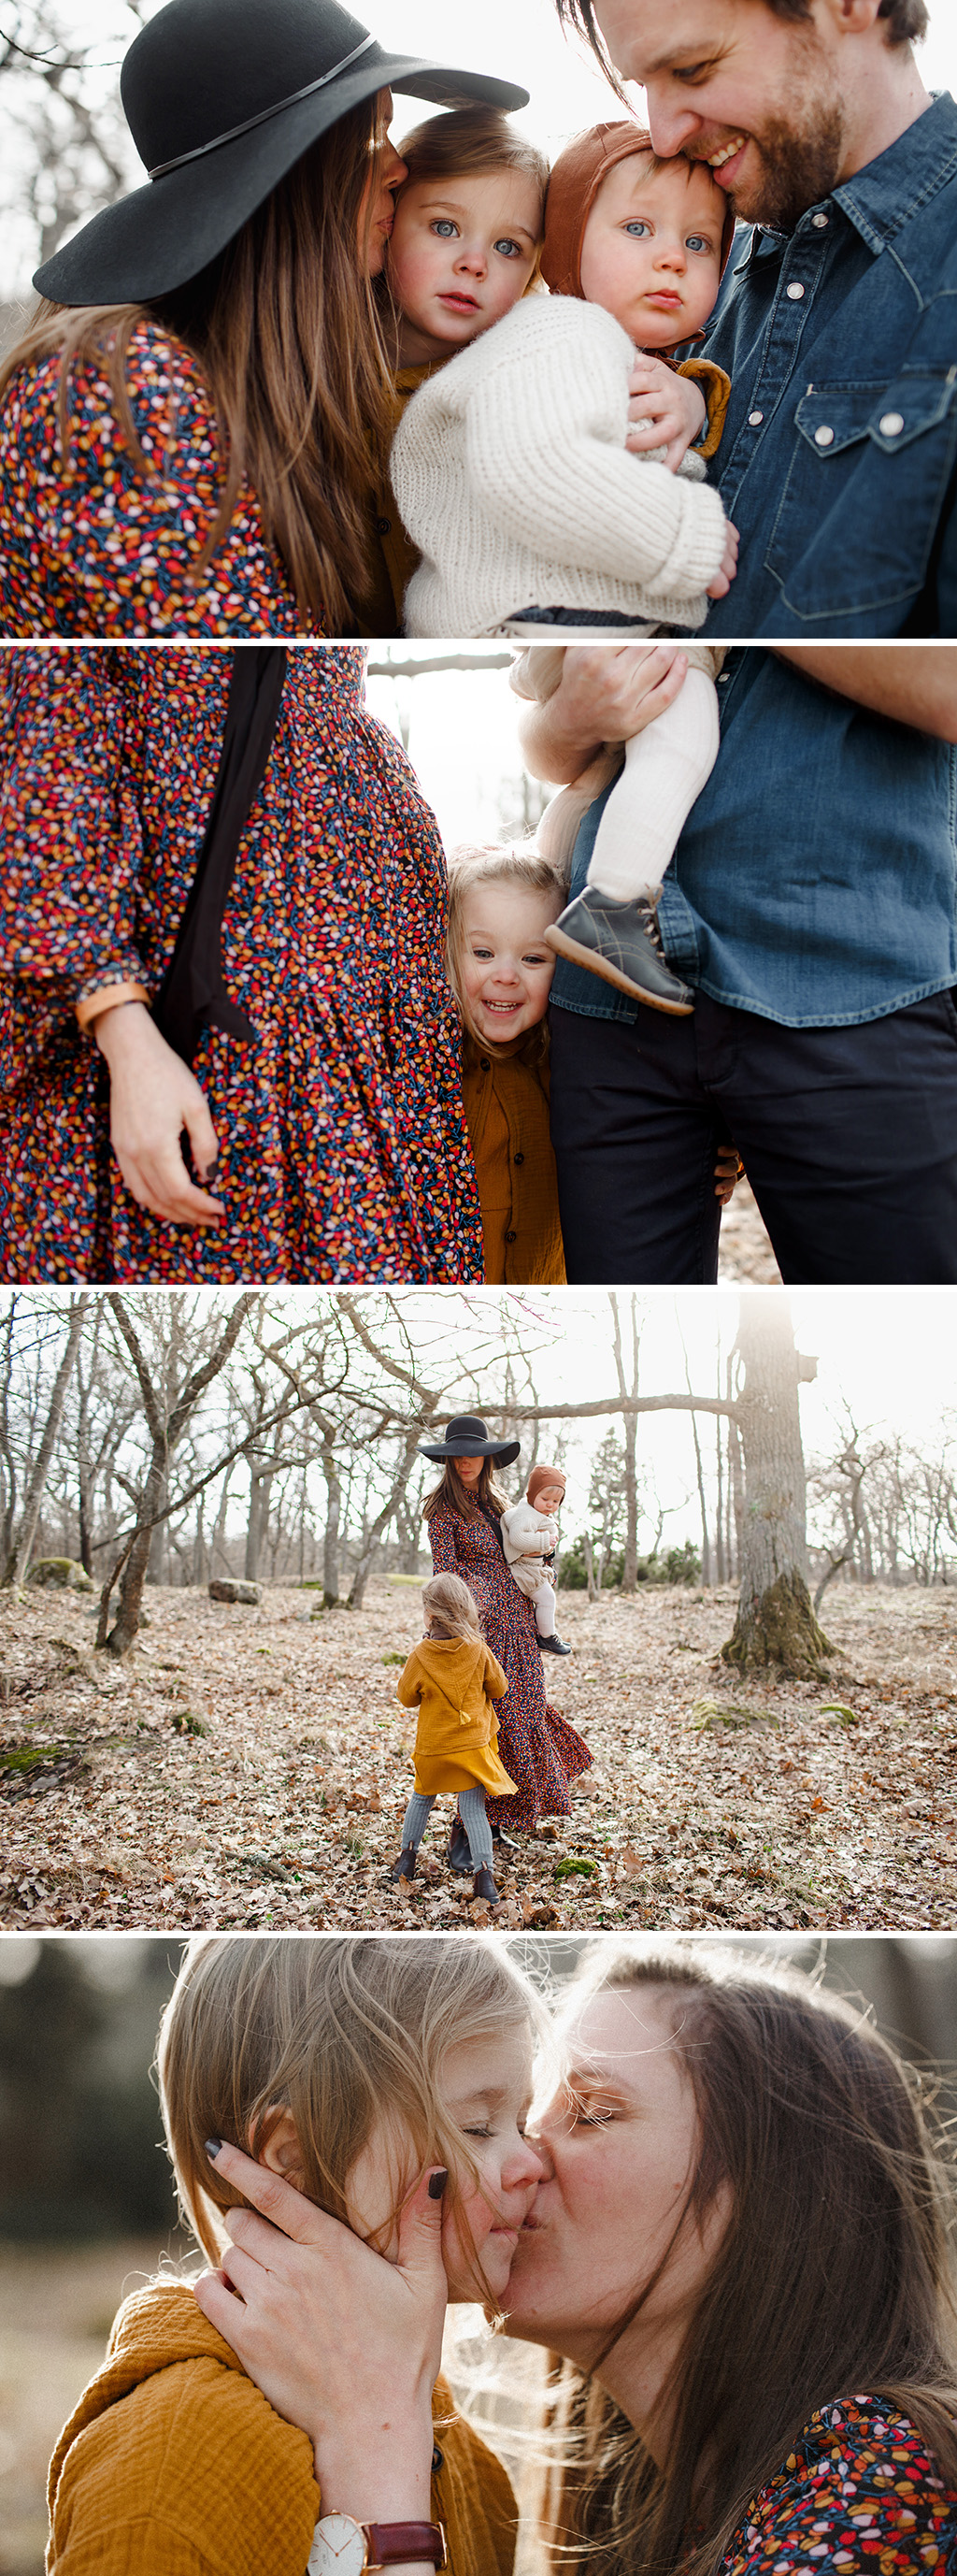 Familjefotograf_Stockholm_Anna-sandstrom_Familjeportratt_Fine-Art-2.jpg